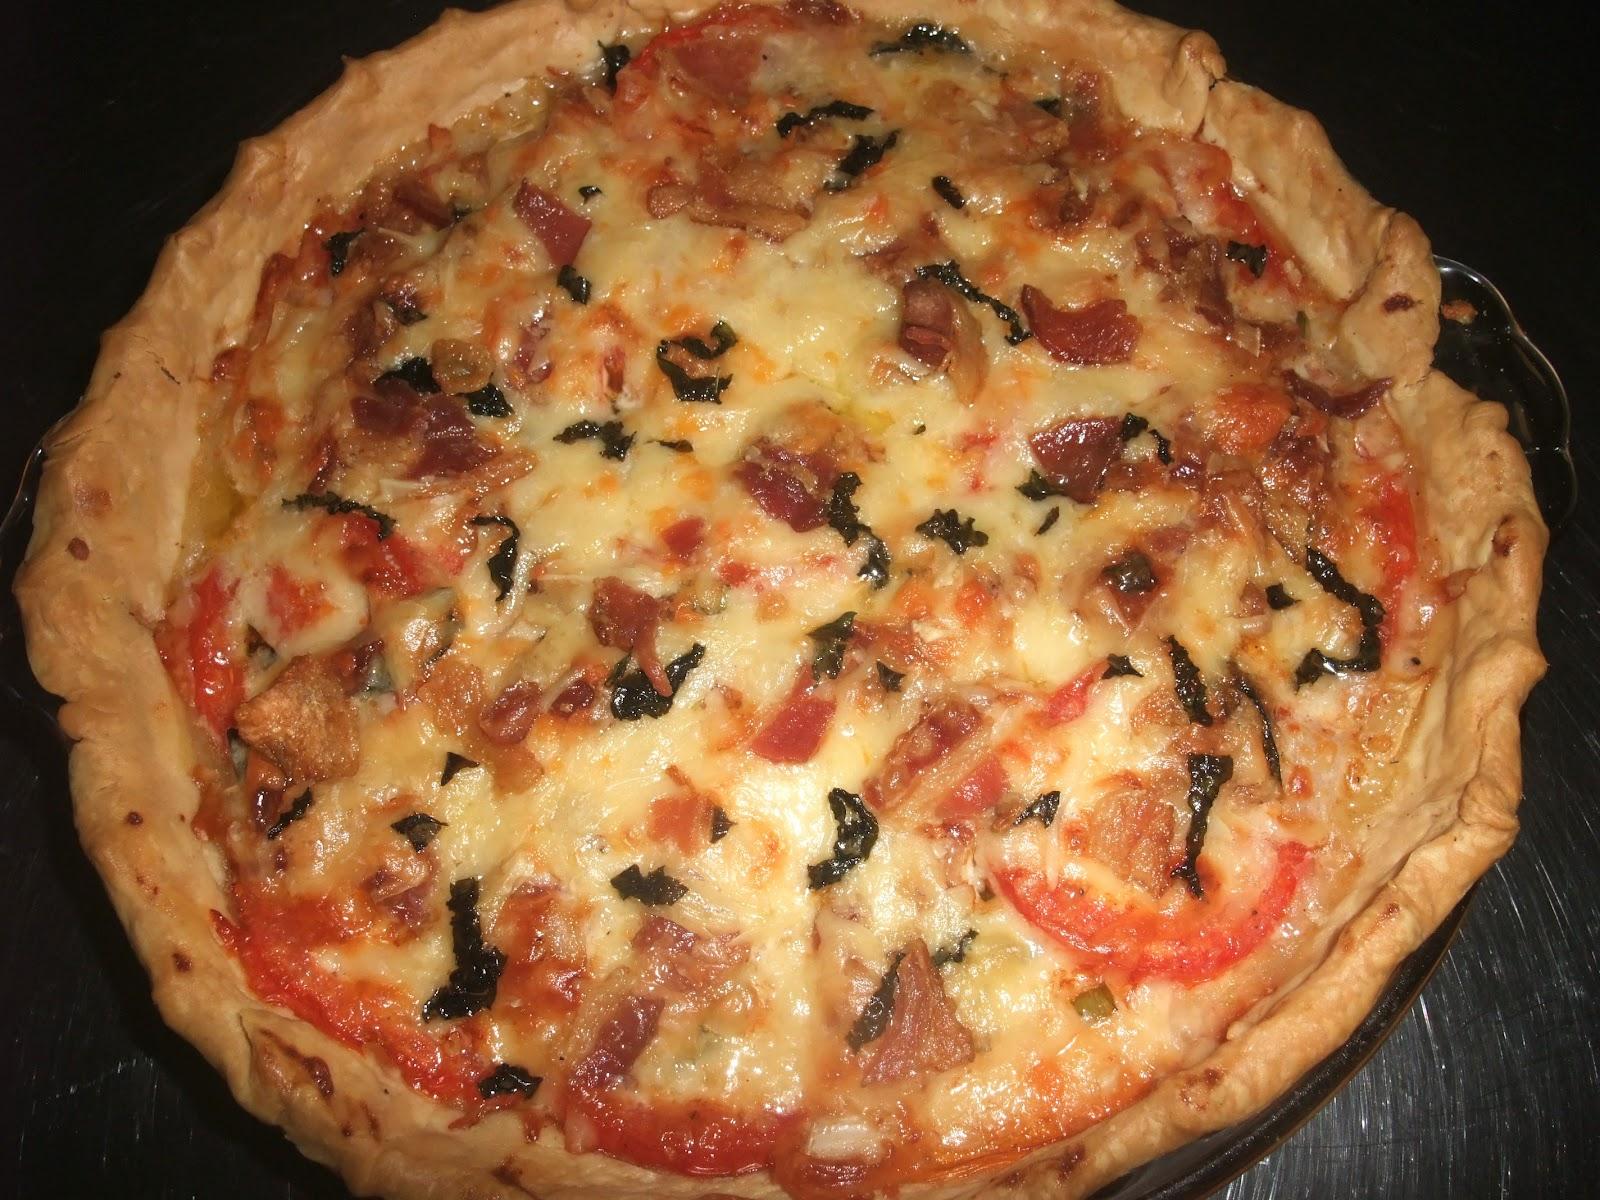 Rosie's Country Baking: Tomato Pie